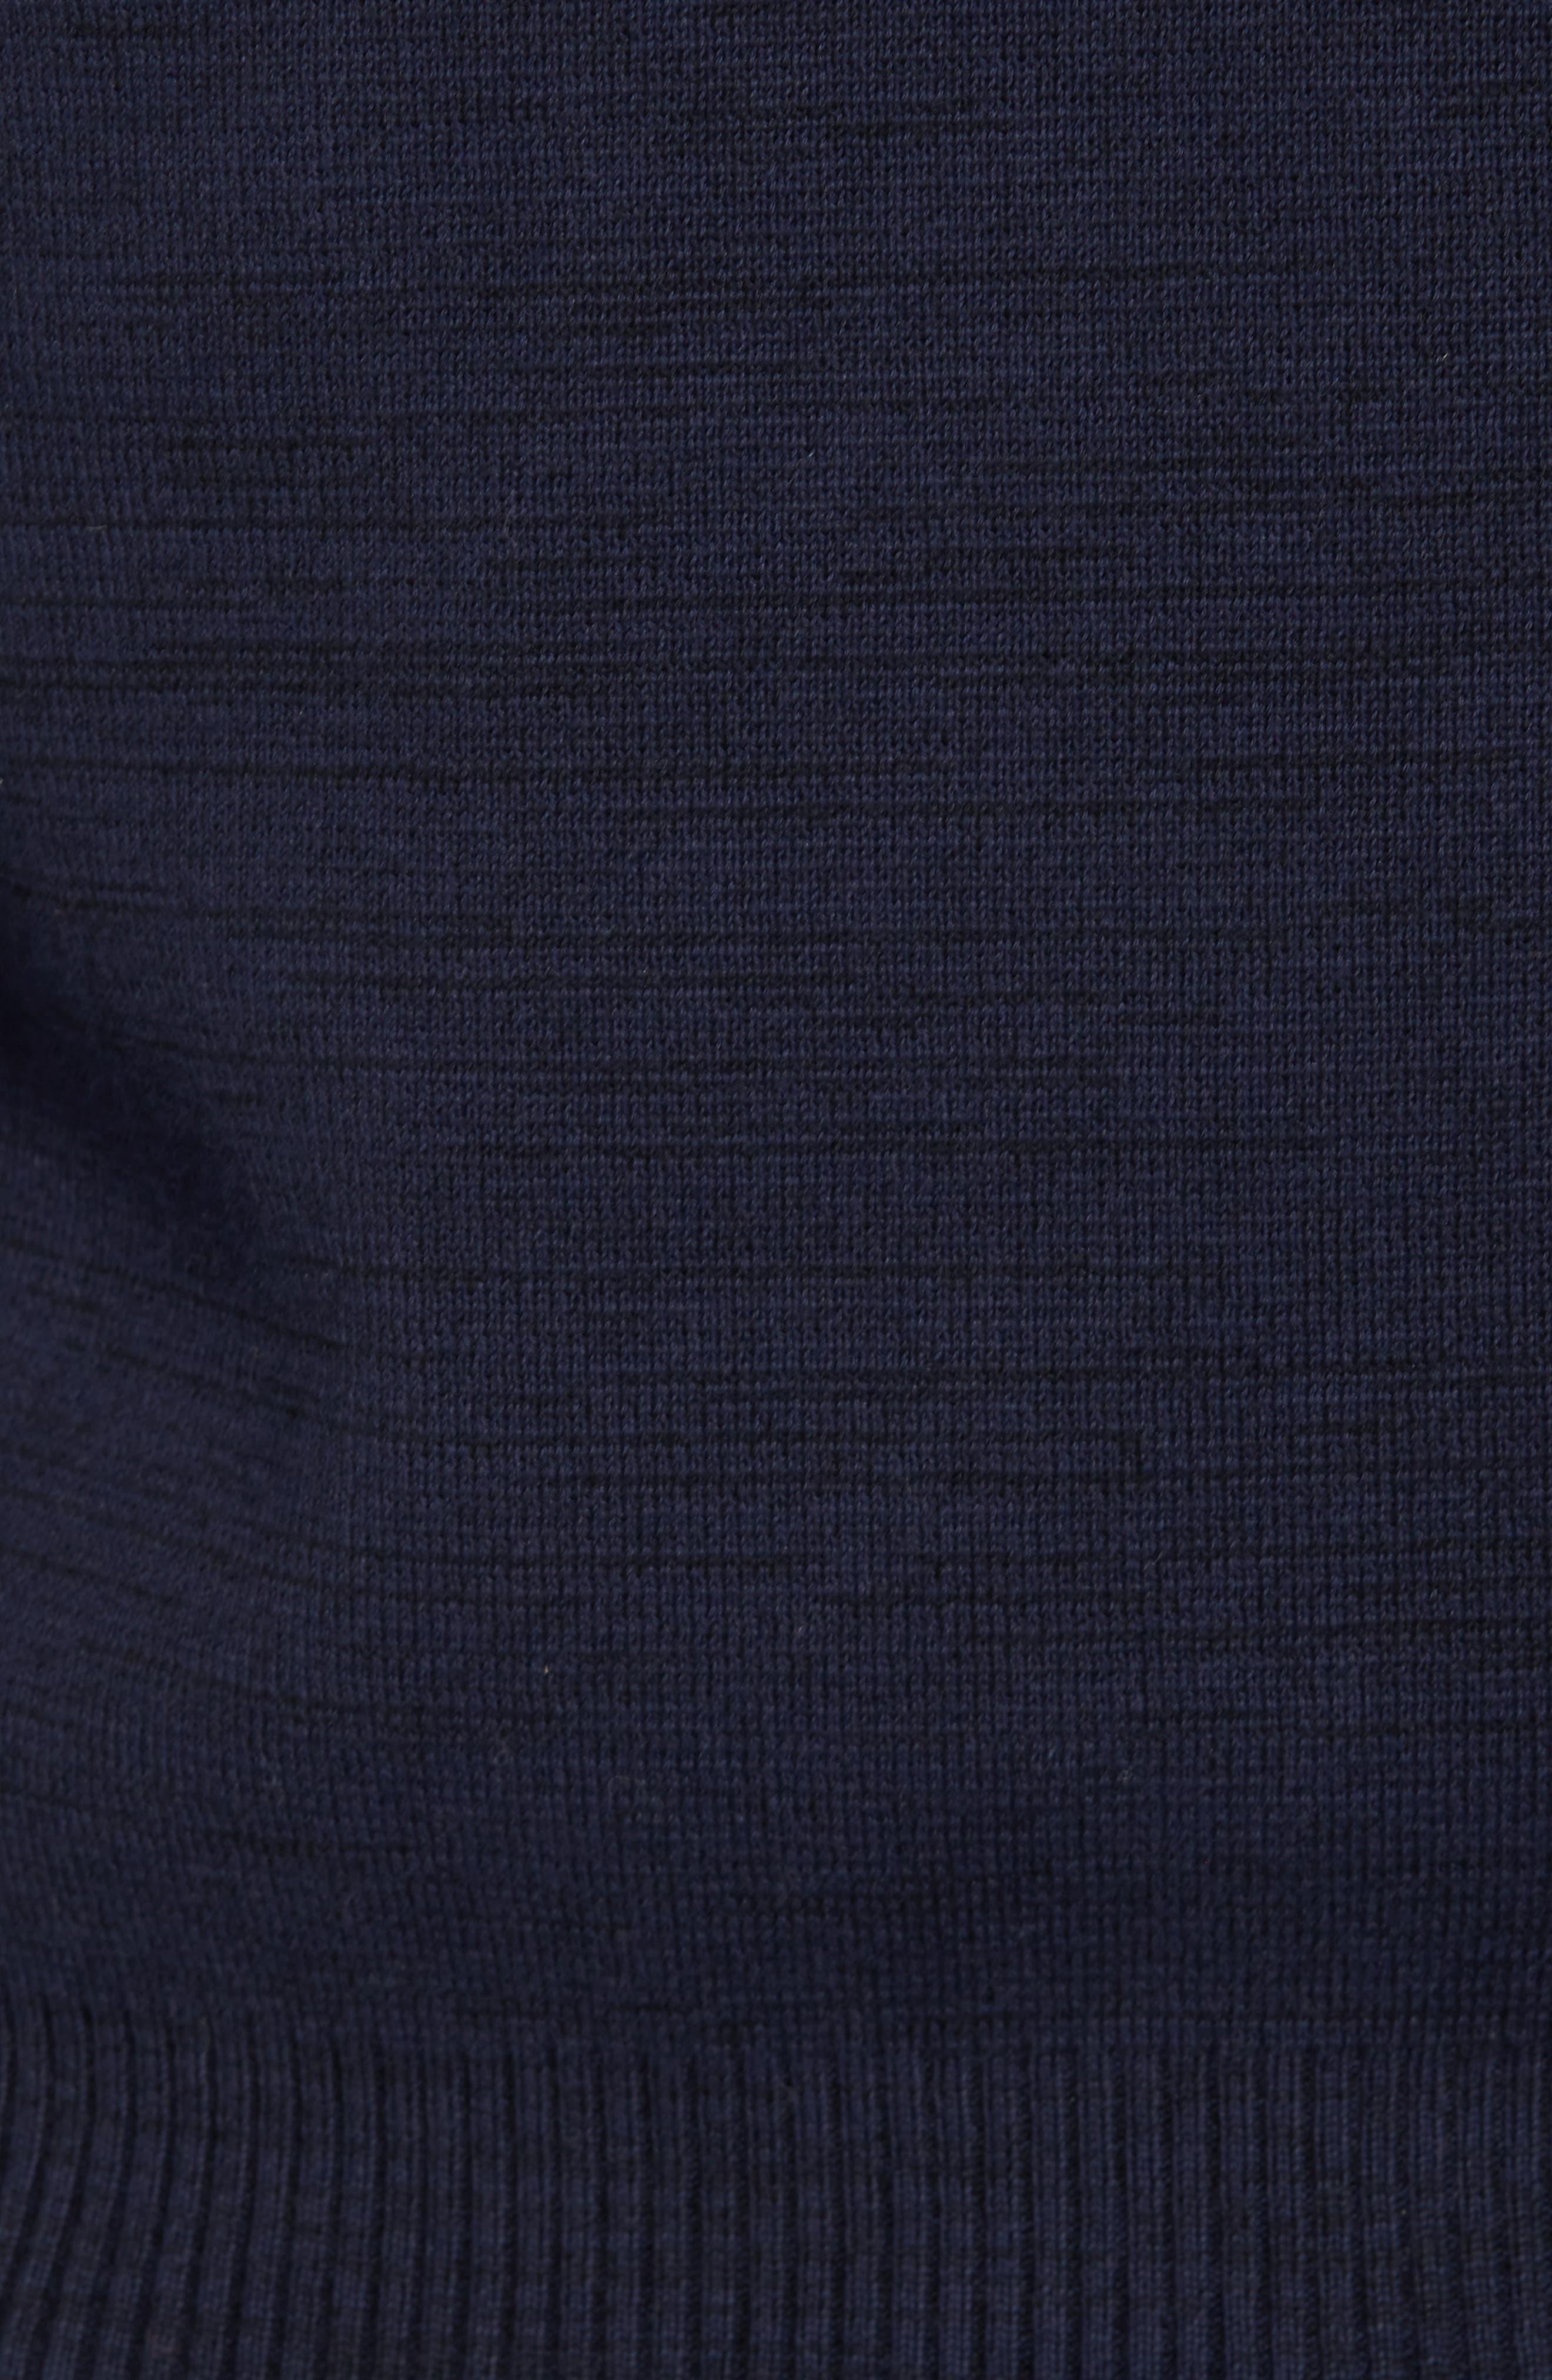 Empral Half-Zip Sweater,                             Alternate thumbnail 5, color,                             Blue/ Dark Black